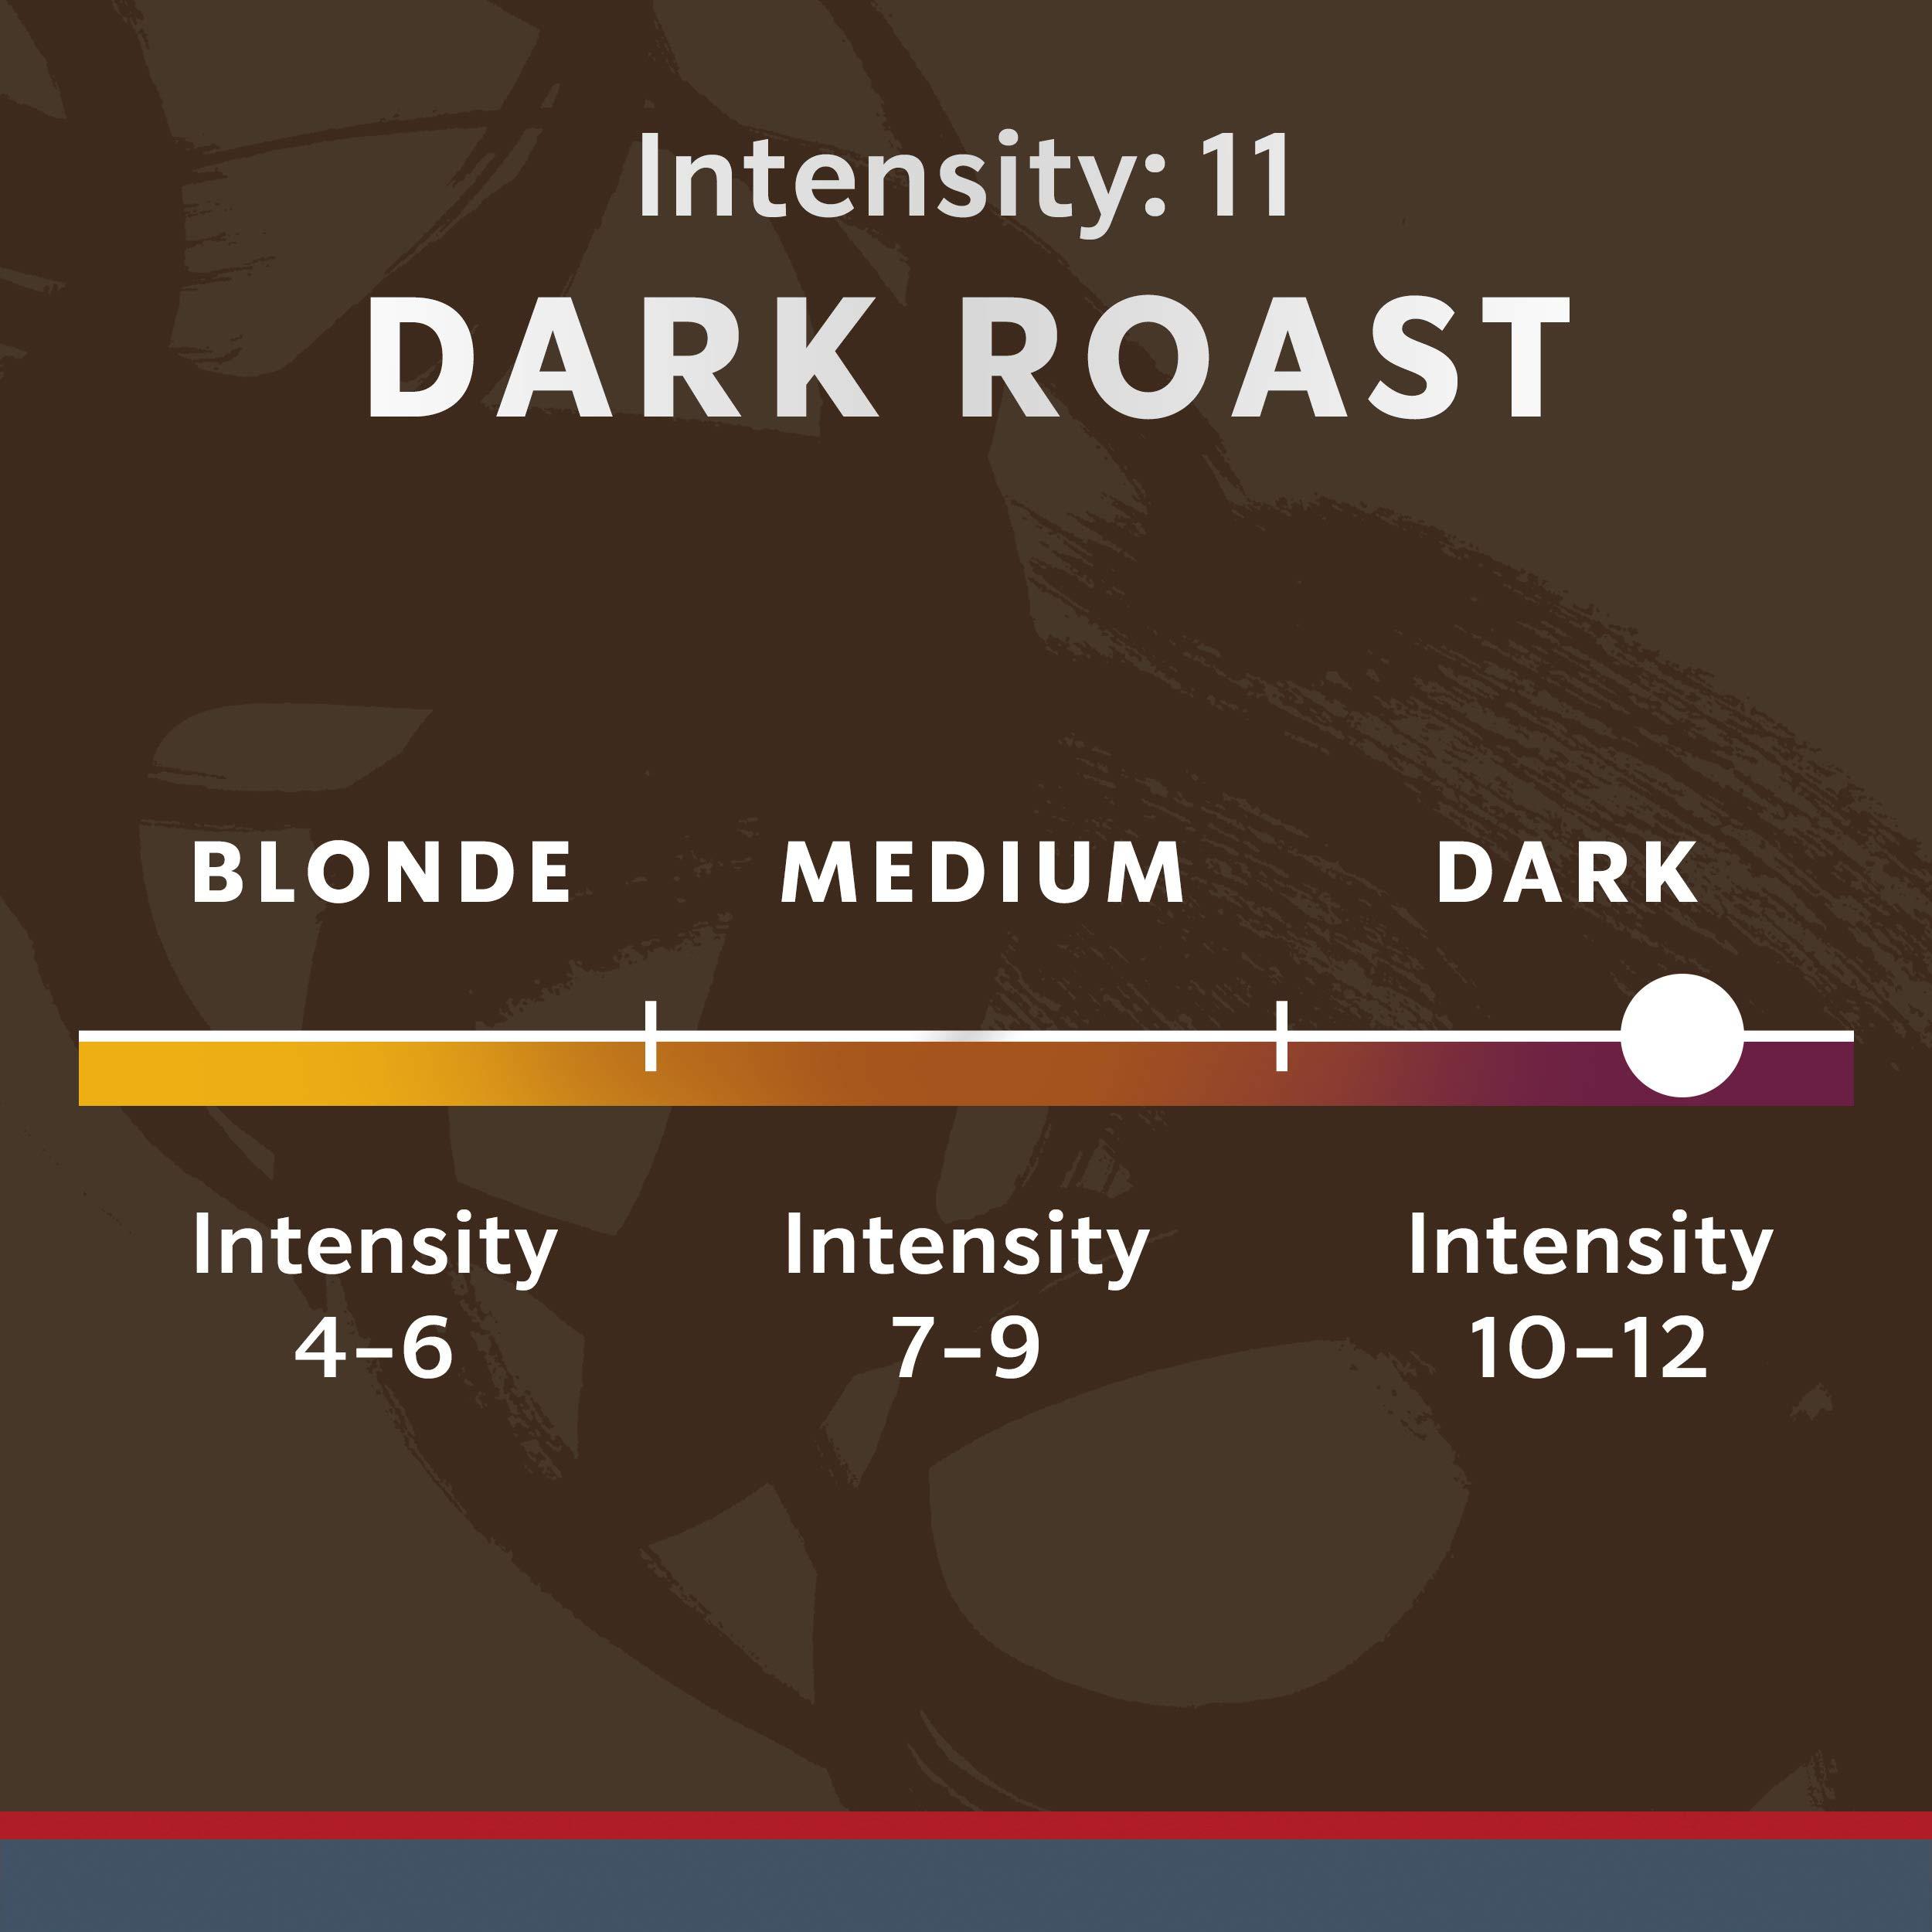 Starbucks by Nespresso, Decaf Espresso Dark Roast (50-count single serve capsules, compatible with Nespresso Original Line System) by Starbucks for Nespresso (Image #4)